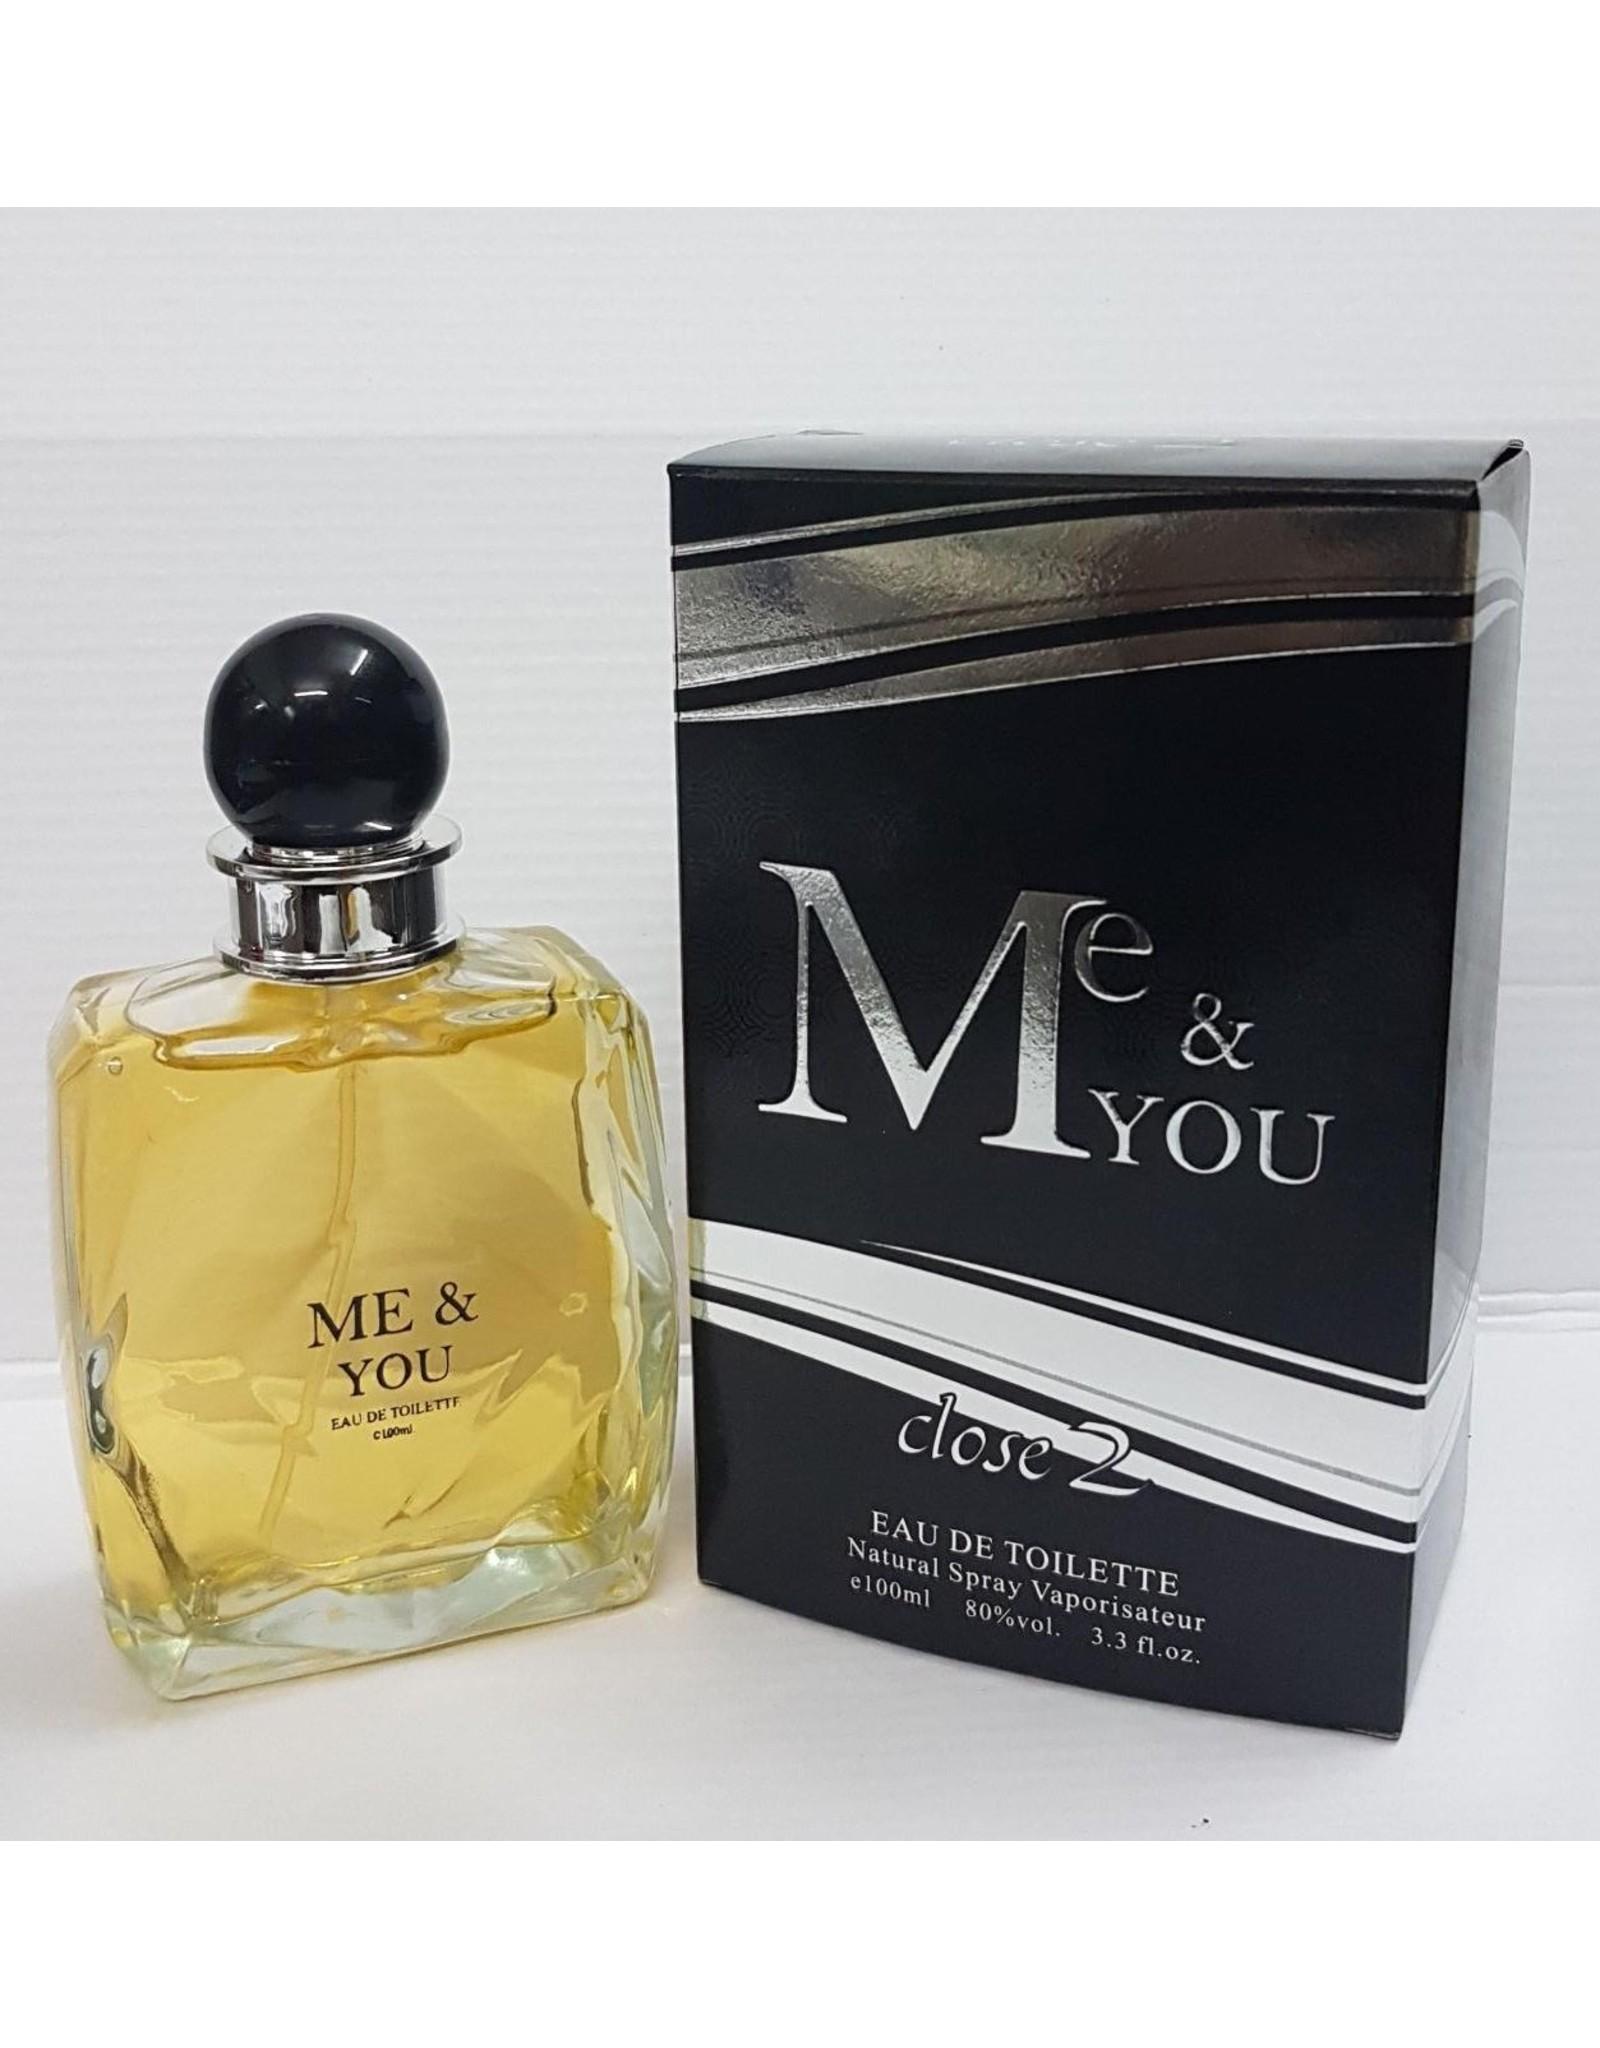 Close 2 parfums Me & you 100 ml EDT homme